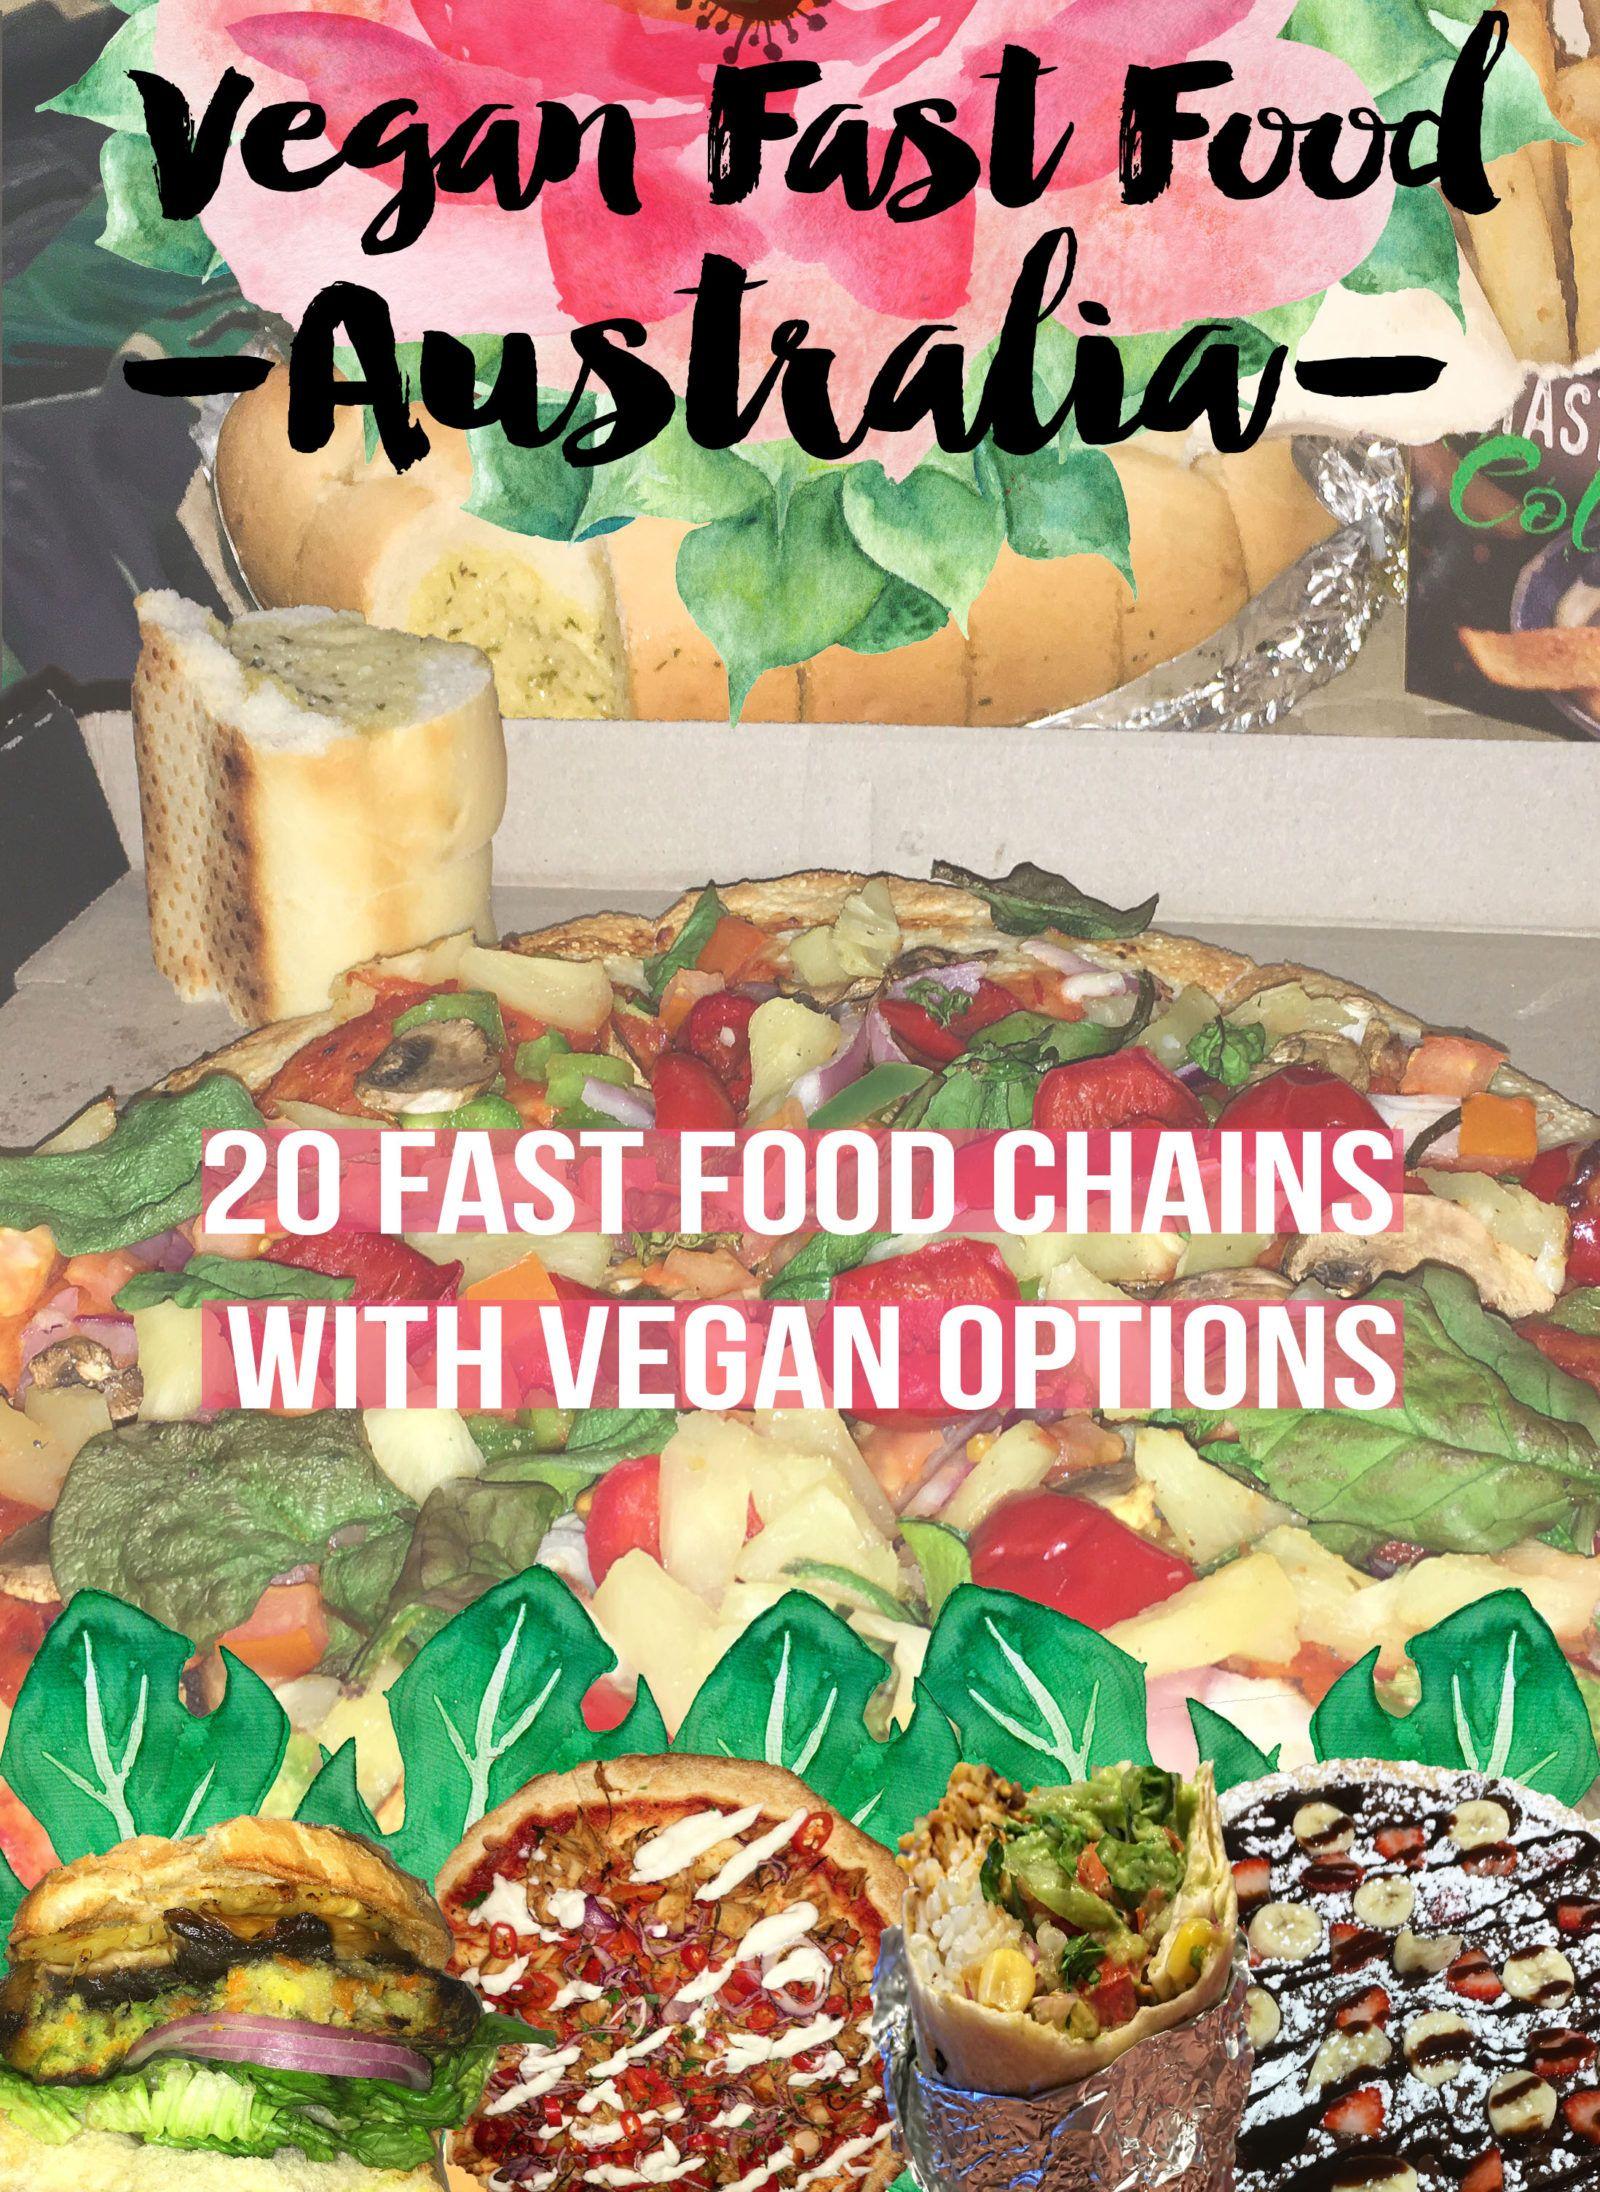 Vegan Fast Food Options in Australia Jessica Grace